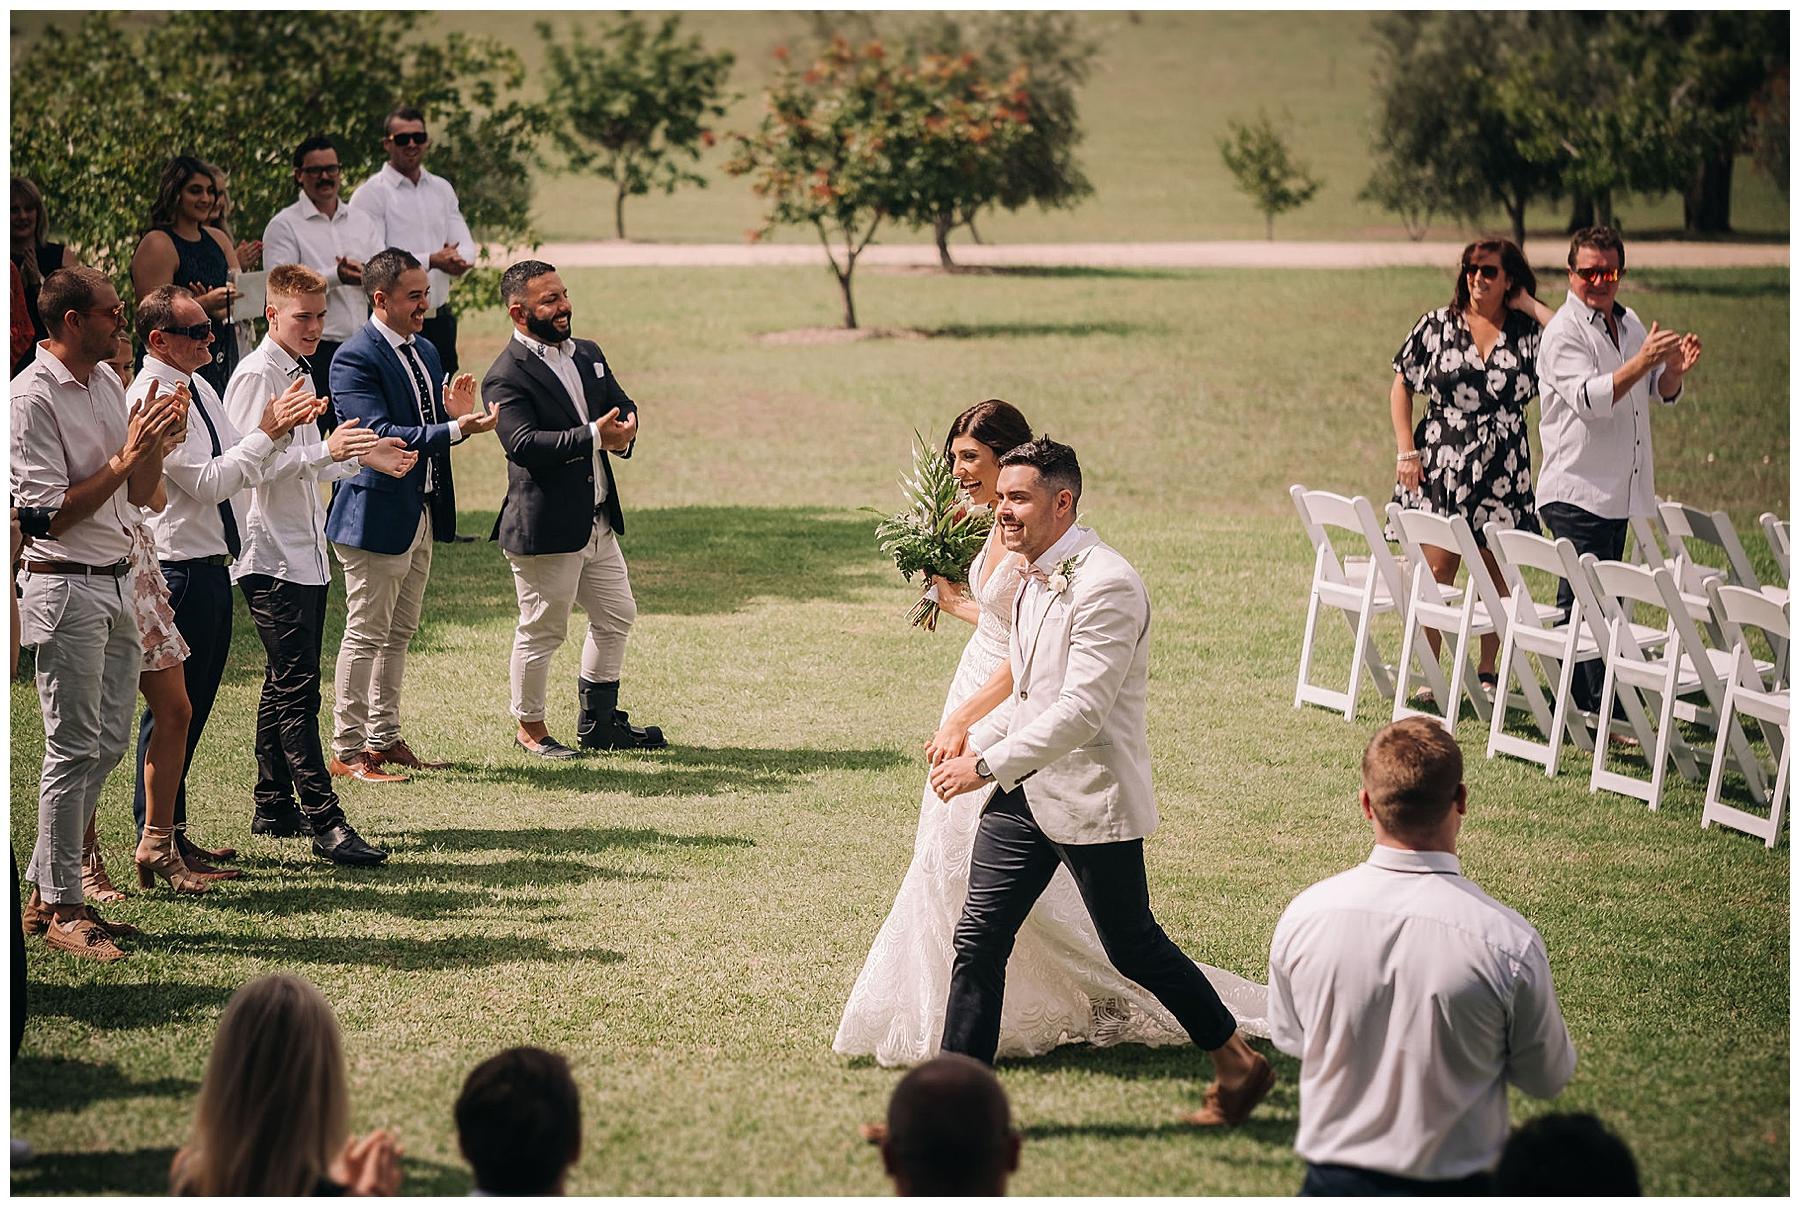 Adam's Peak Wedding Photos + Popcorn Photography_0035.jpg